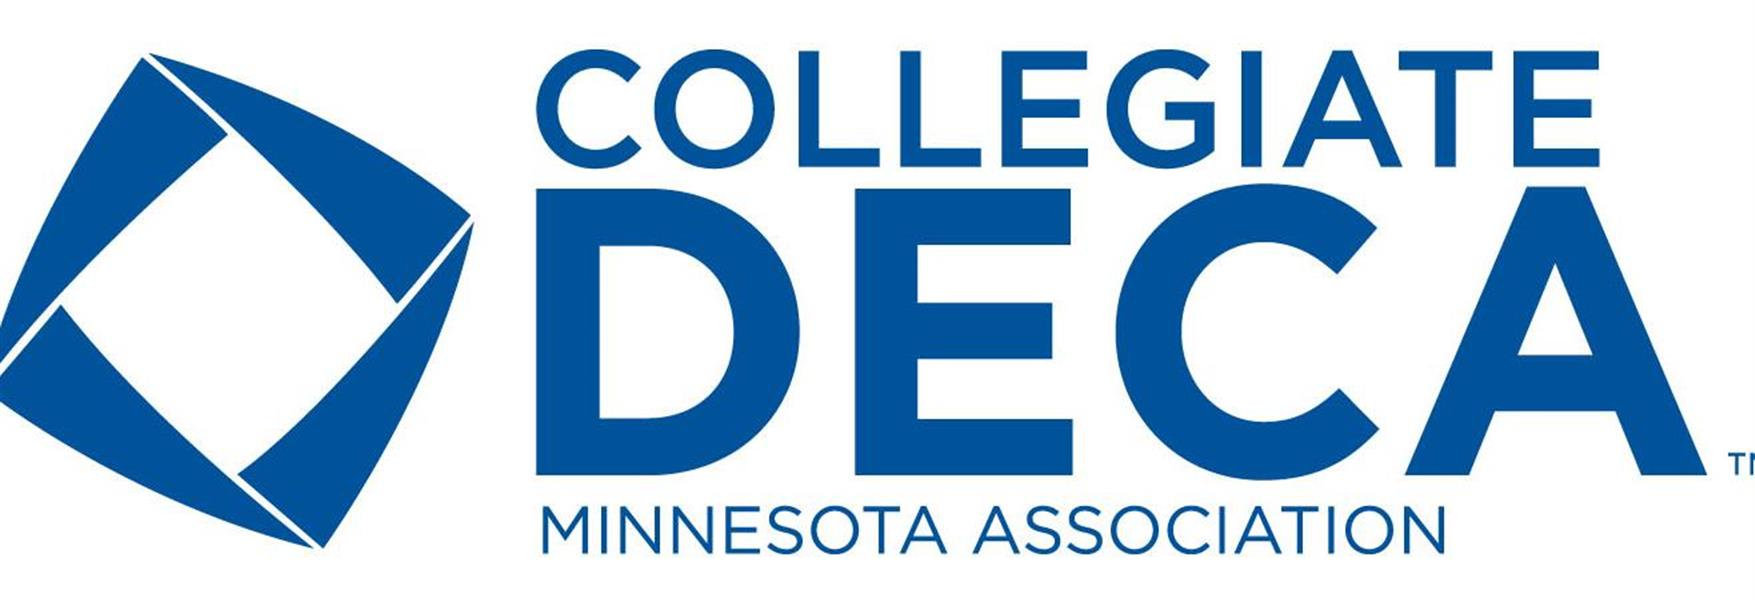 6707850c-4e0b-420e-b534-3a4b3e197423_MN Collegiate DECA Horiz Blue.jpg